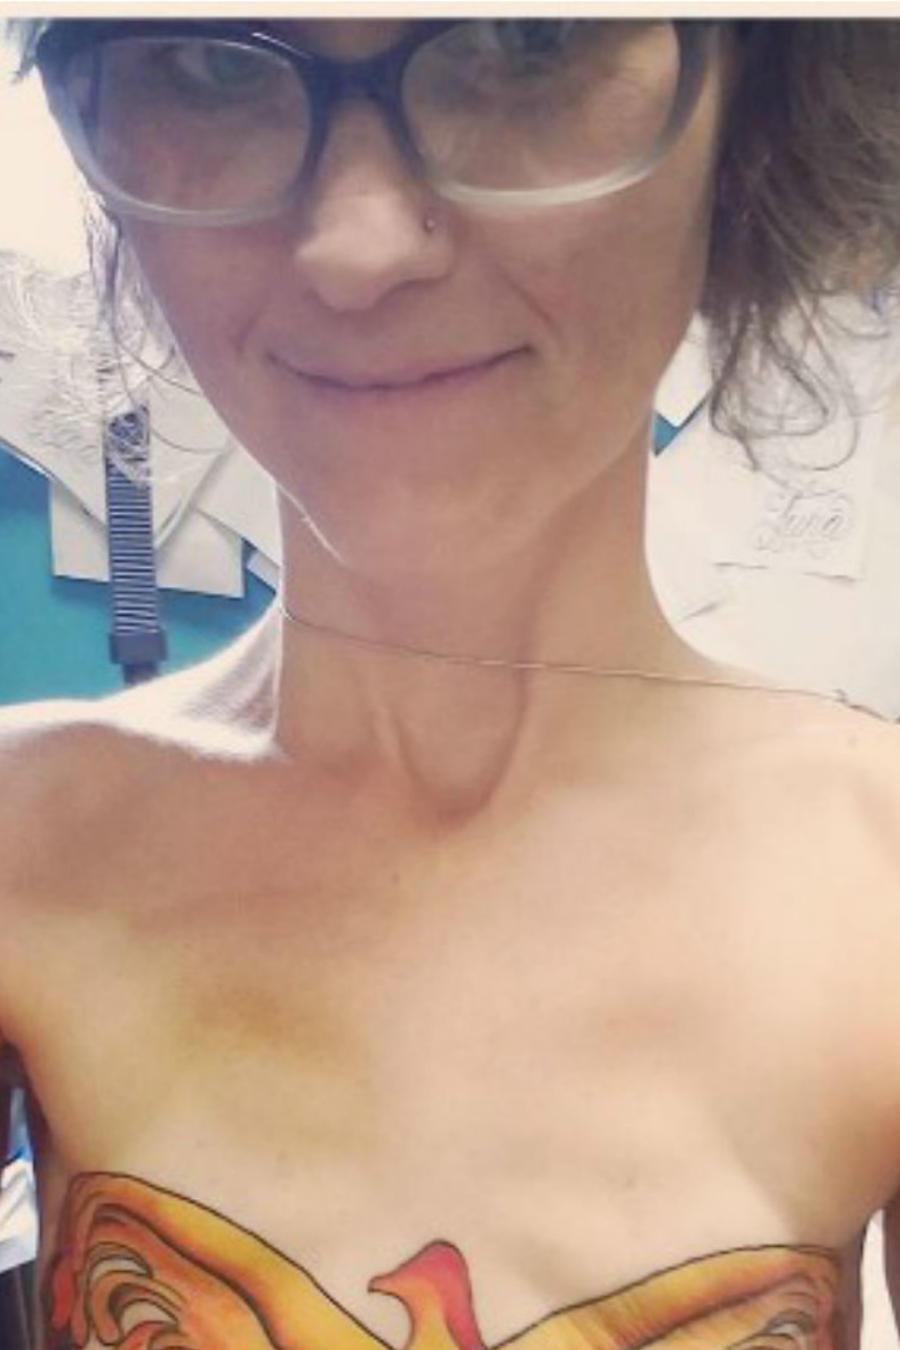 Mujer con tatuaje de Wonder Woman